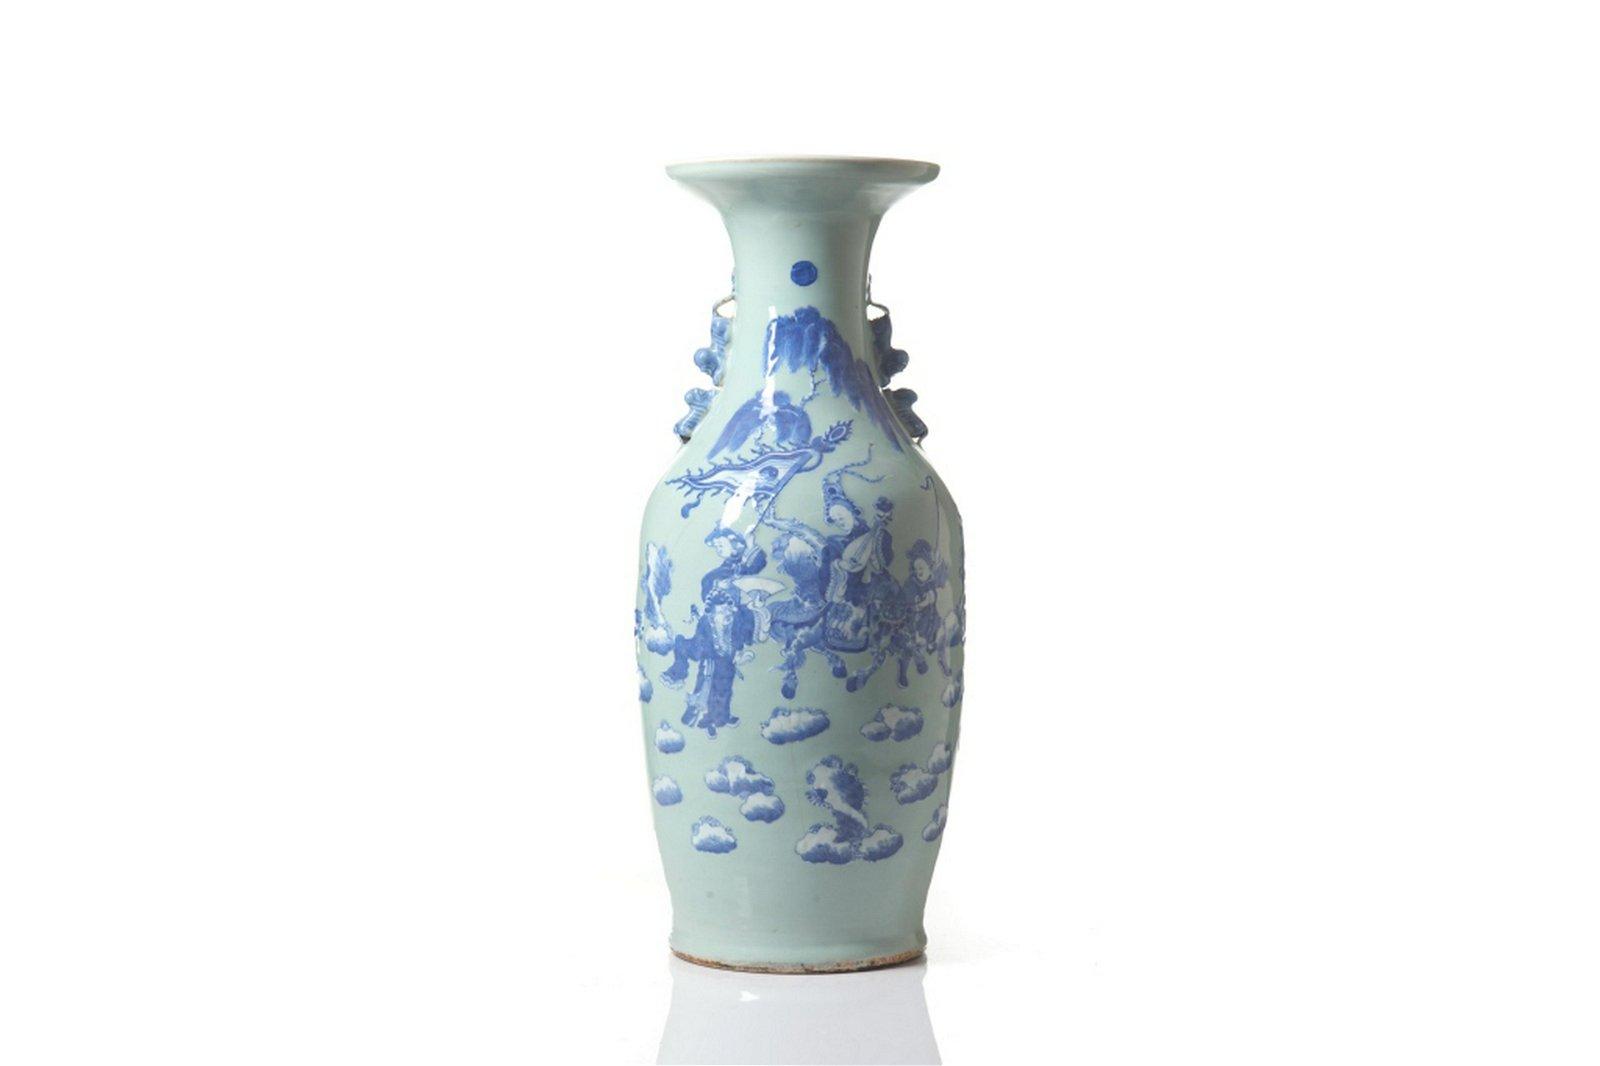 CHINESE CELADON GROUND BLUE & WHITE PORCELAIN VASE